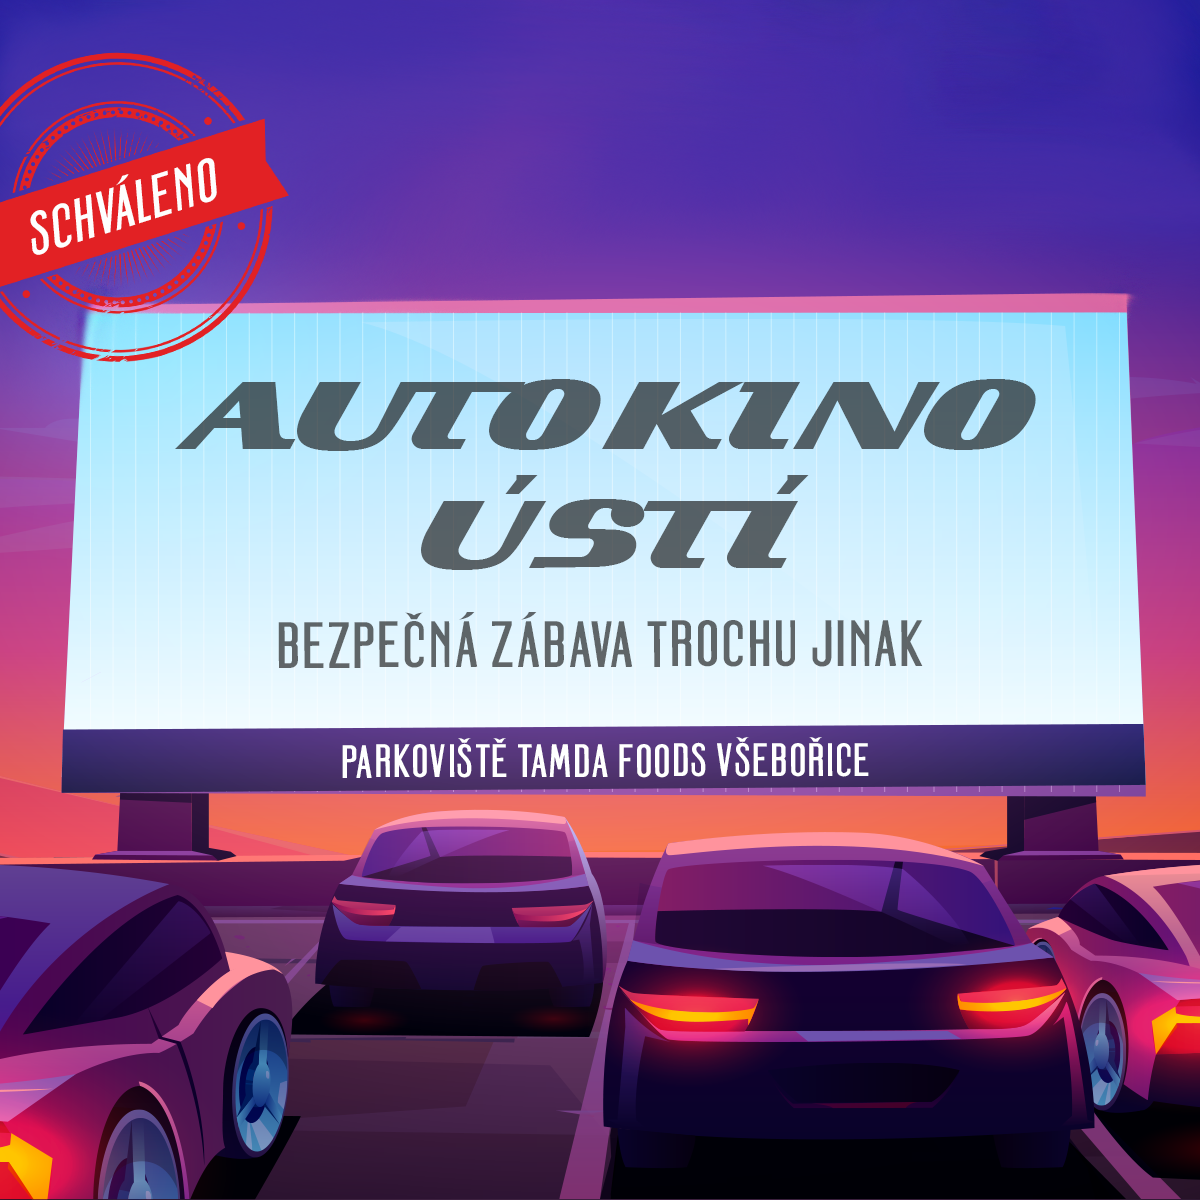 Autokino - Ústí nad Labem - Kolej jinak